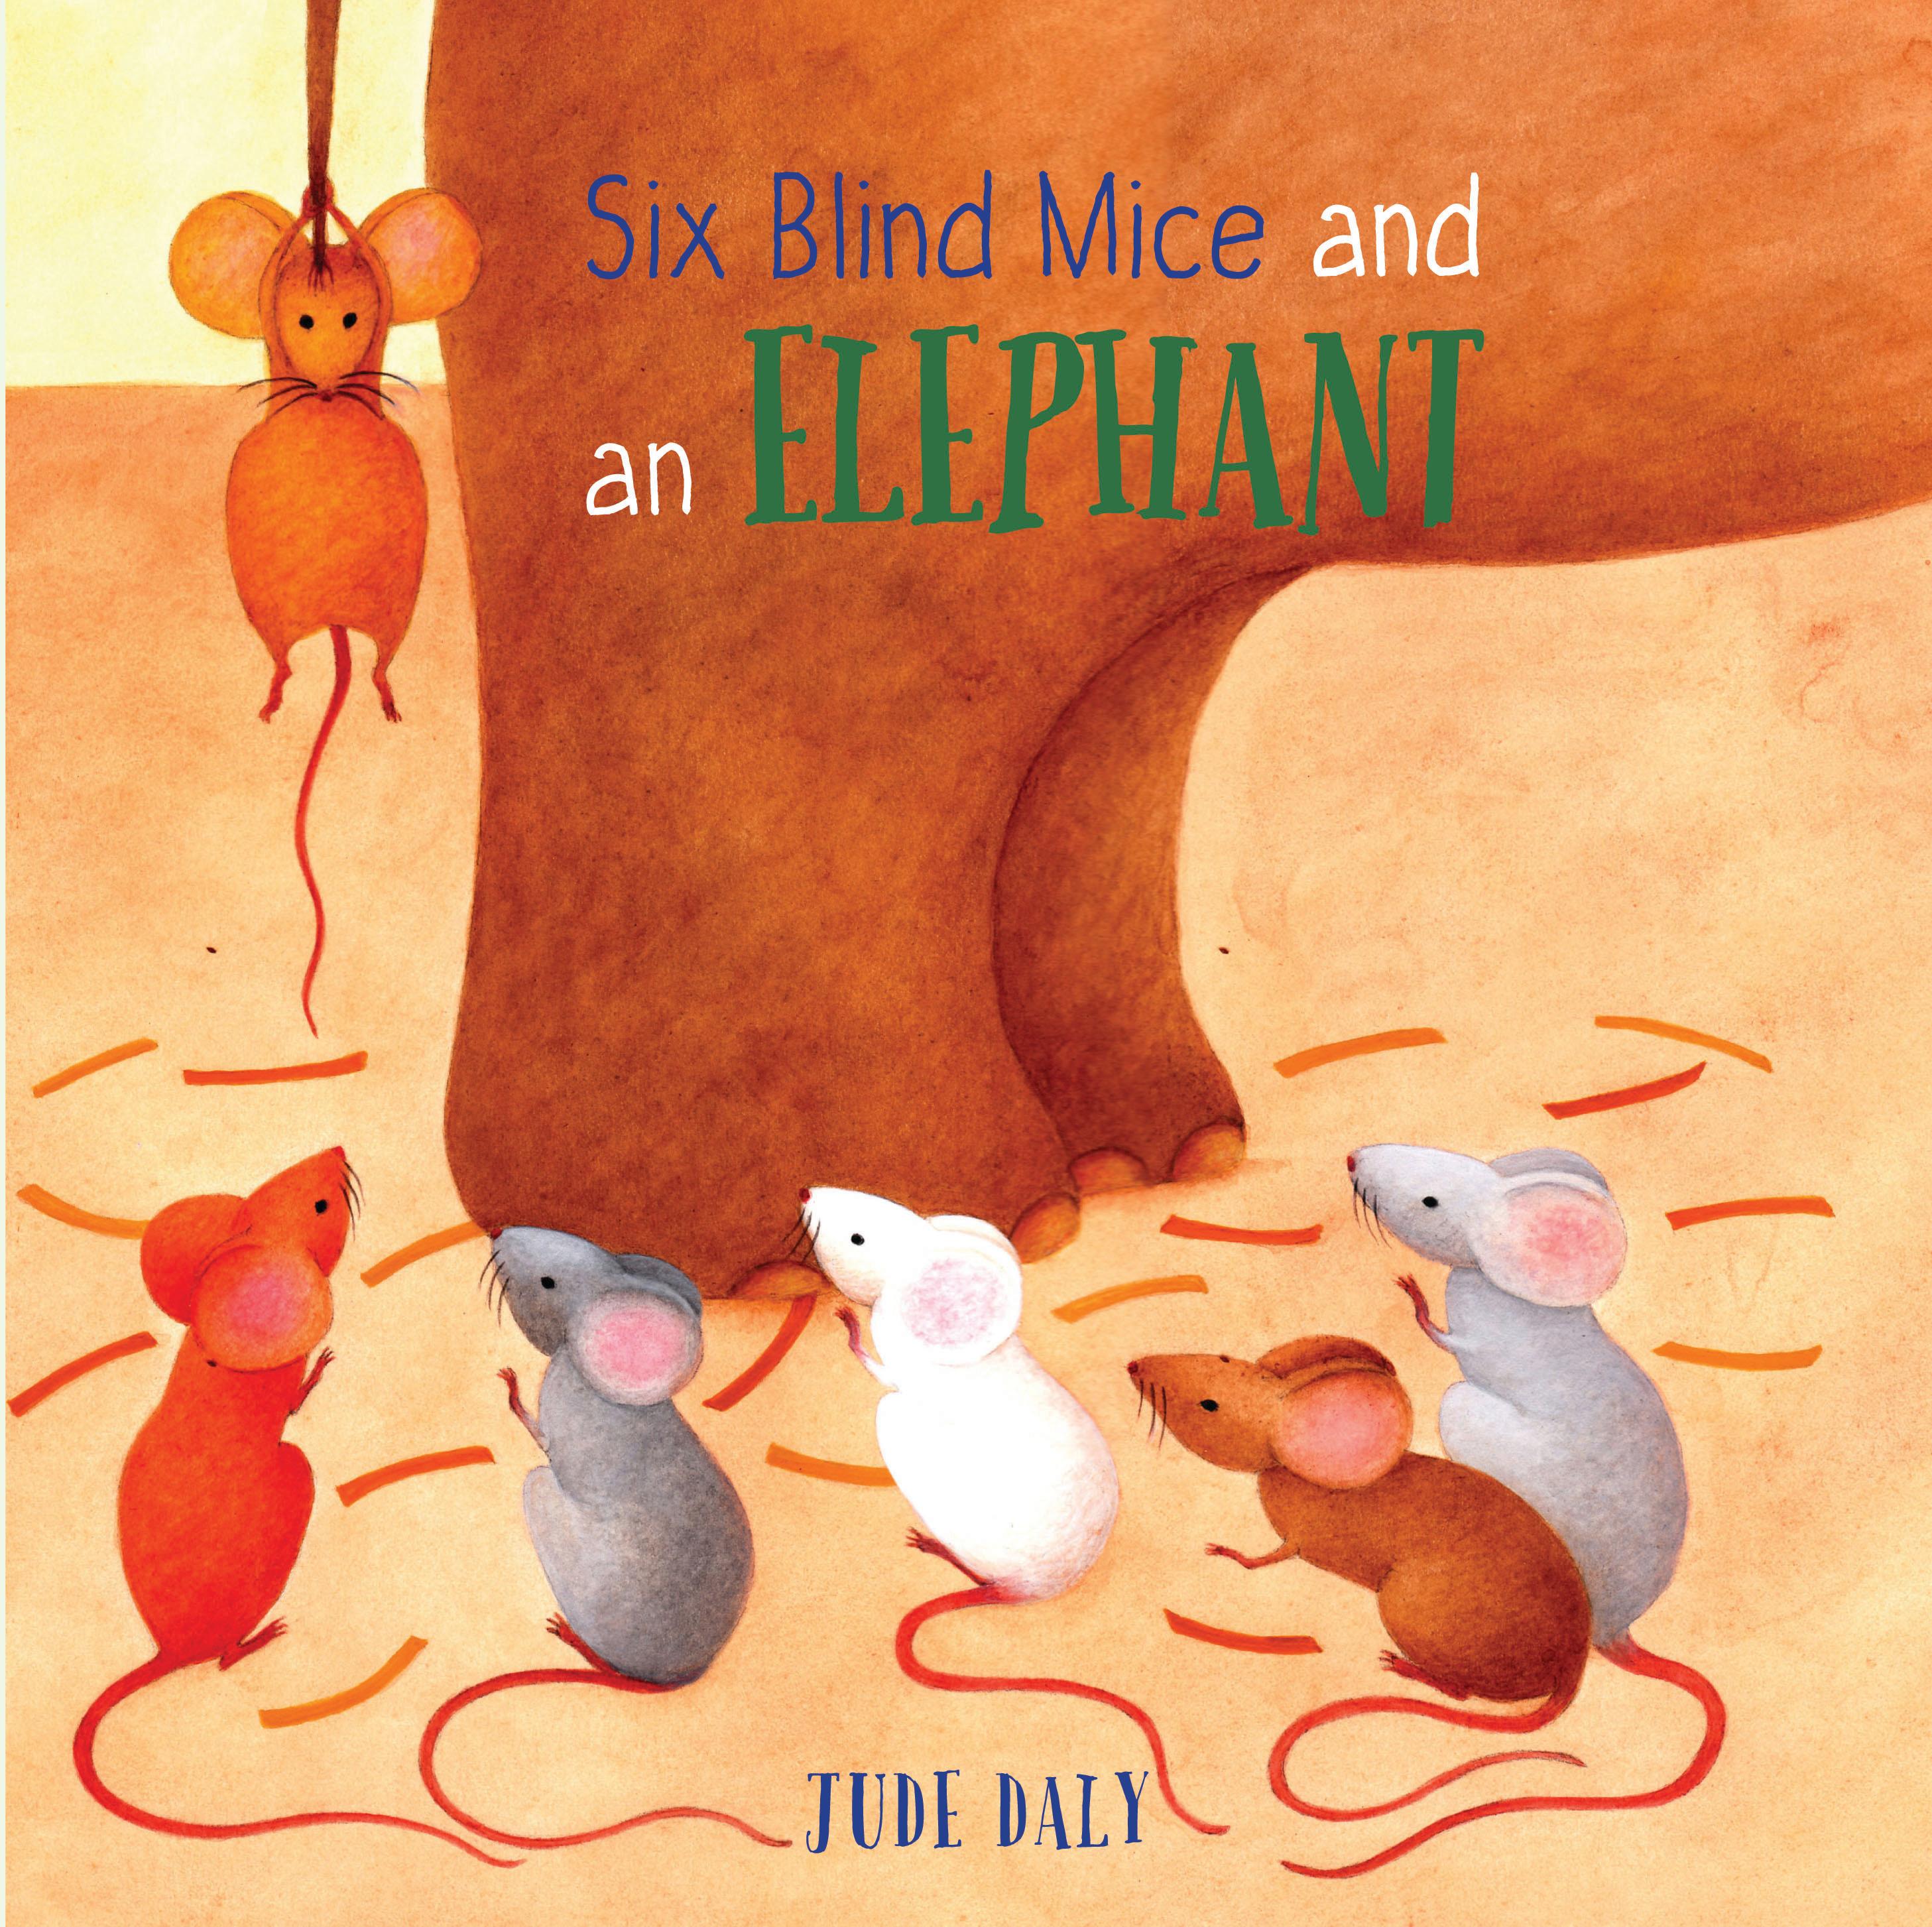 Six Blind Mice and an Elephant